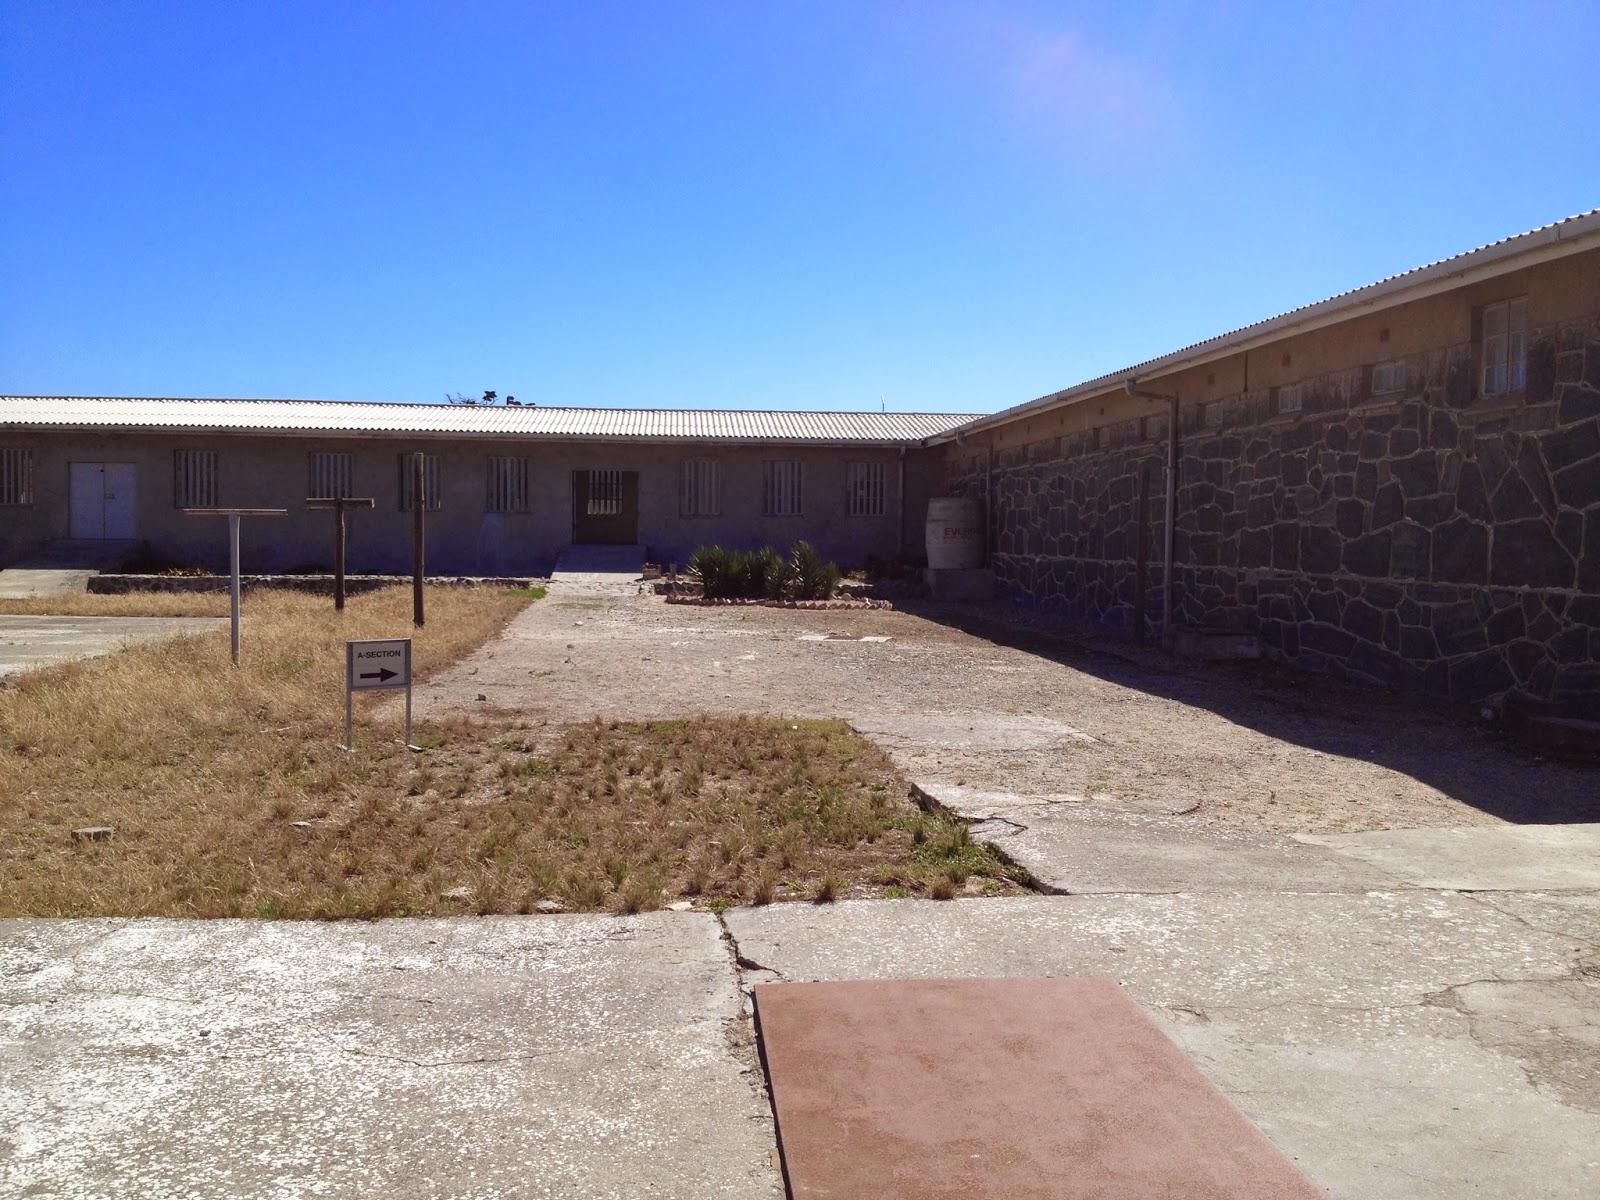 Robben Island - Prison courtyard next to Nelson Mandela's cell